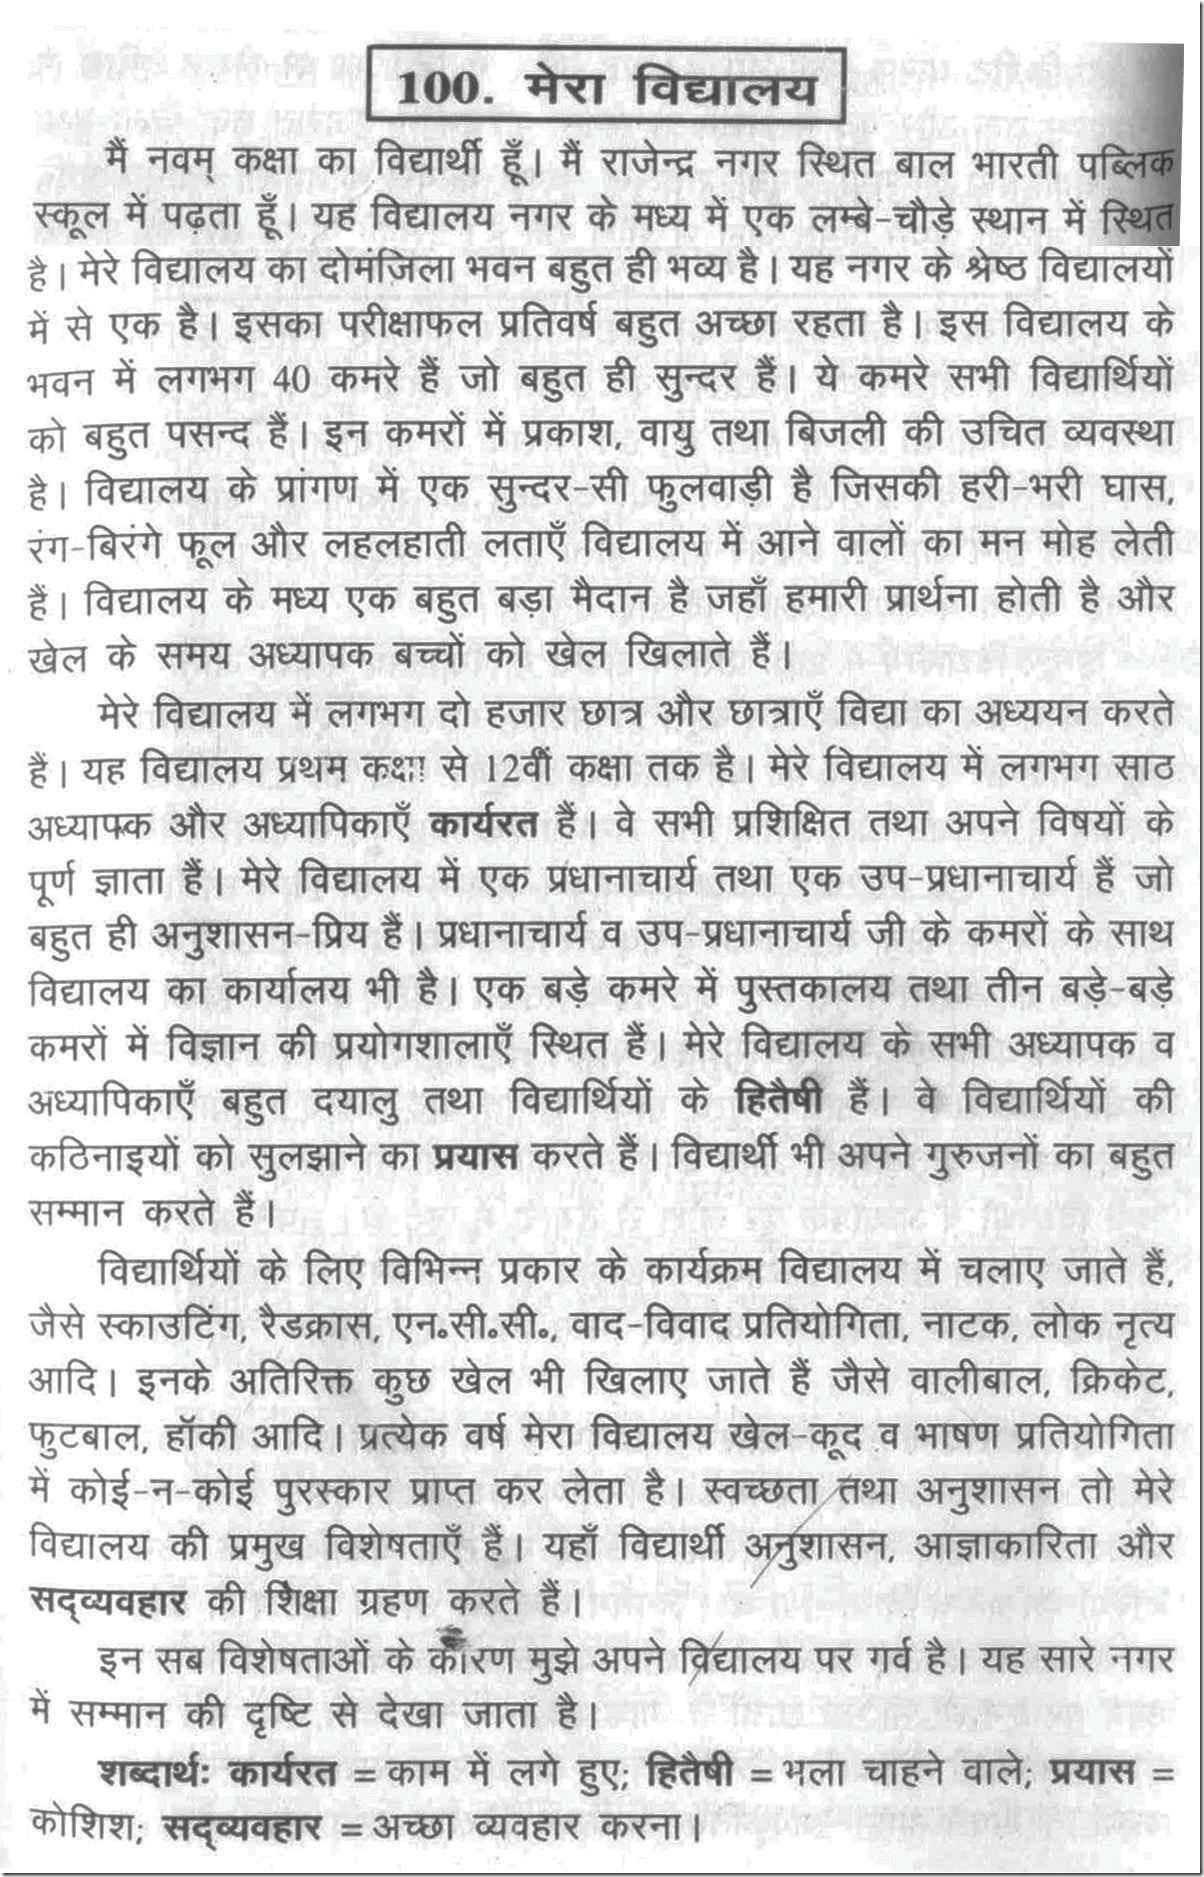 my school essay for kids in marathi   get an essay or any other  my school essay for kids in marathi